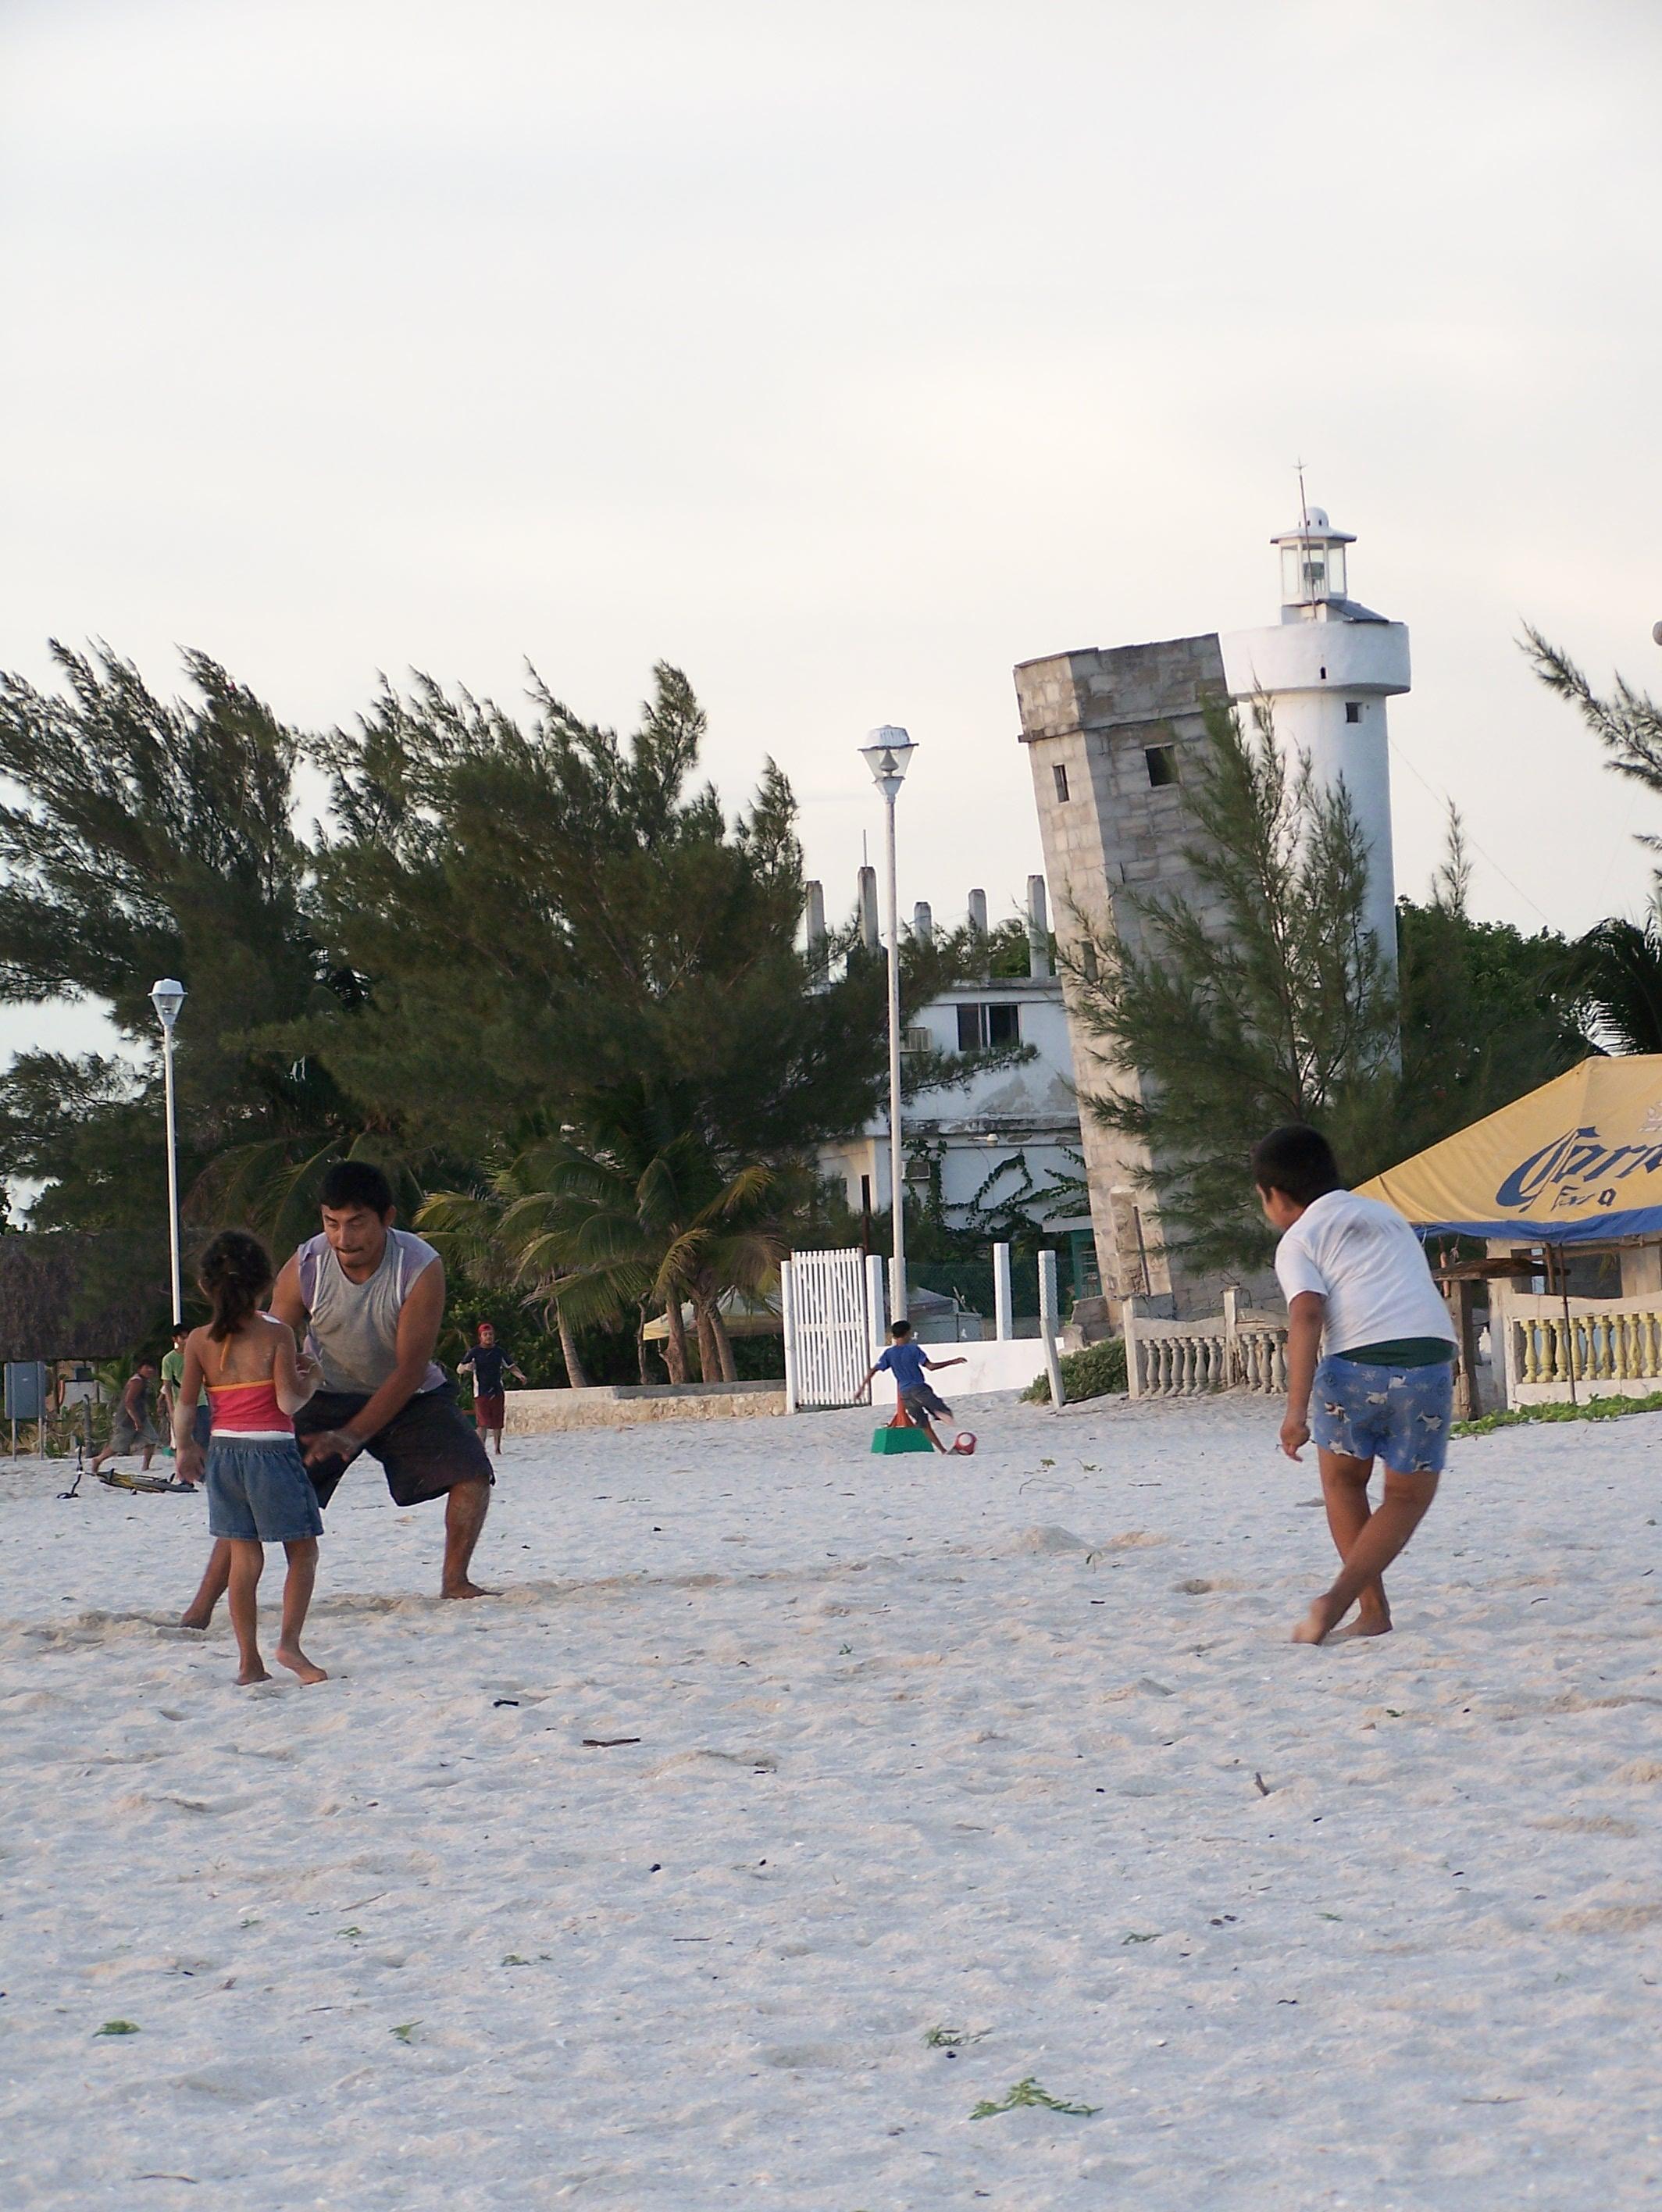 Enjoying the Beach in Celestun (The old Lighthouse)